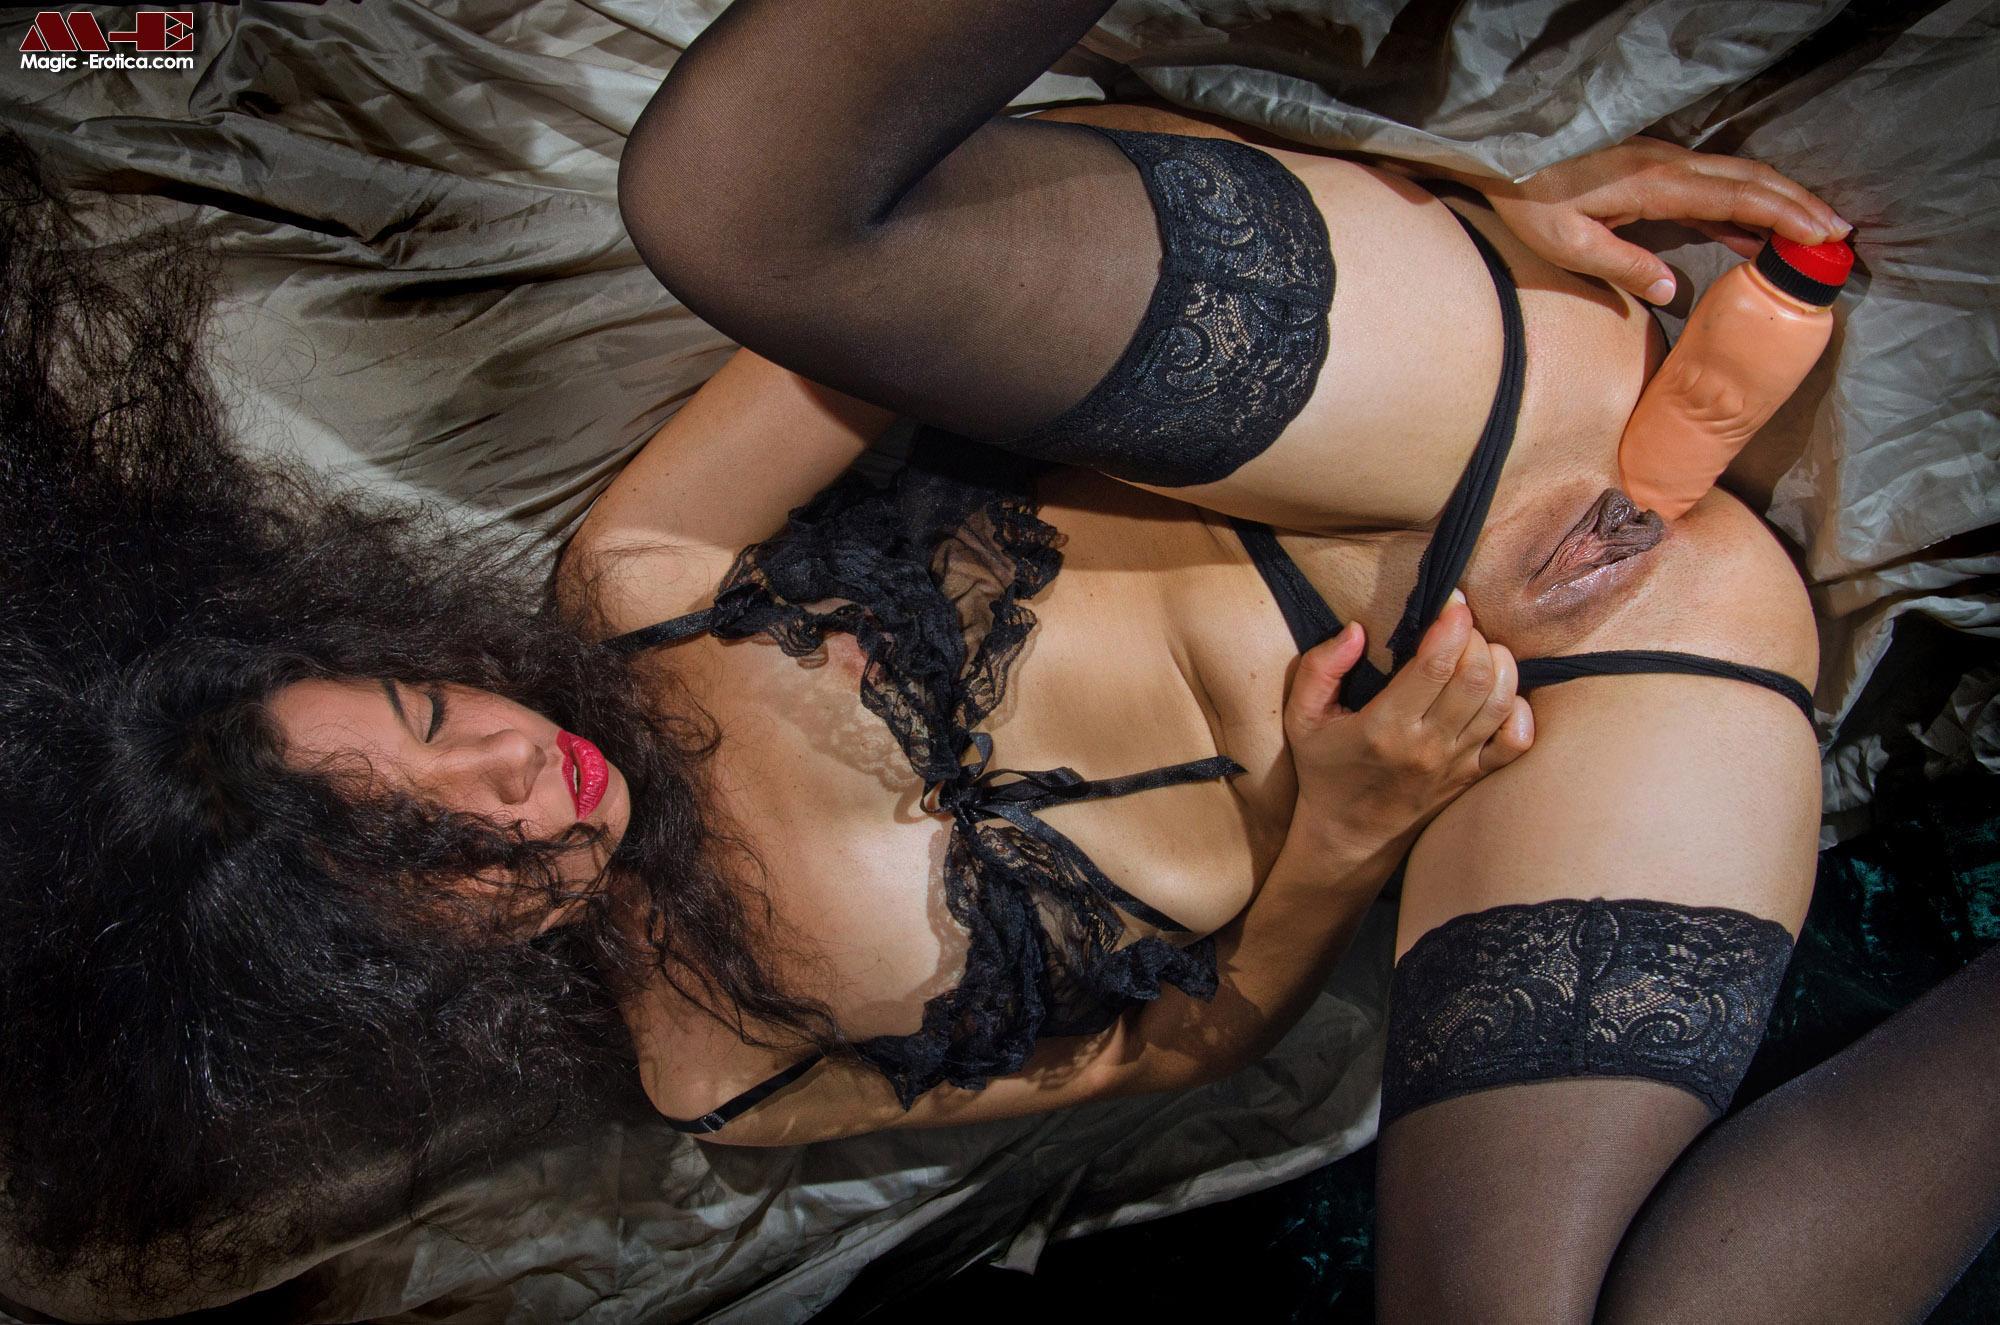 idoia magic erotica Click to Enlarge